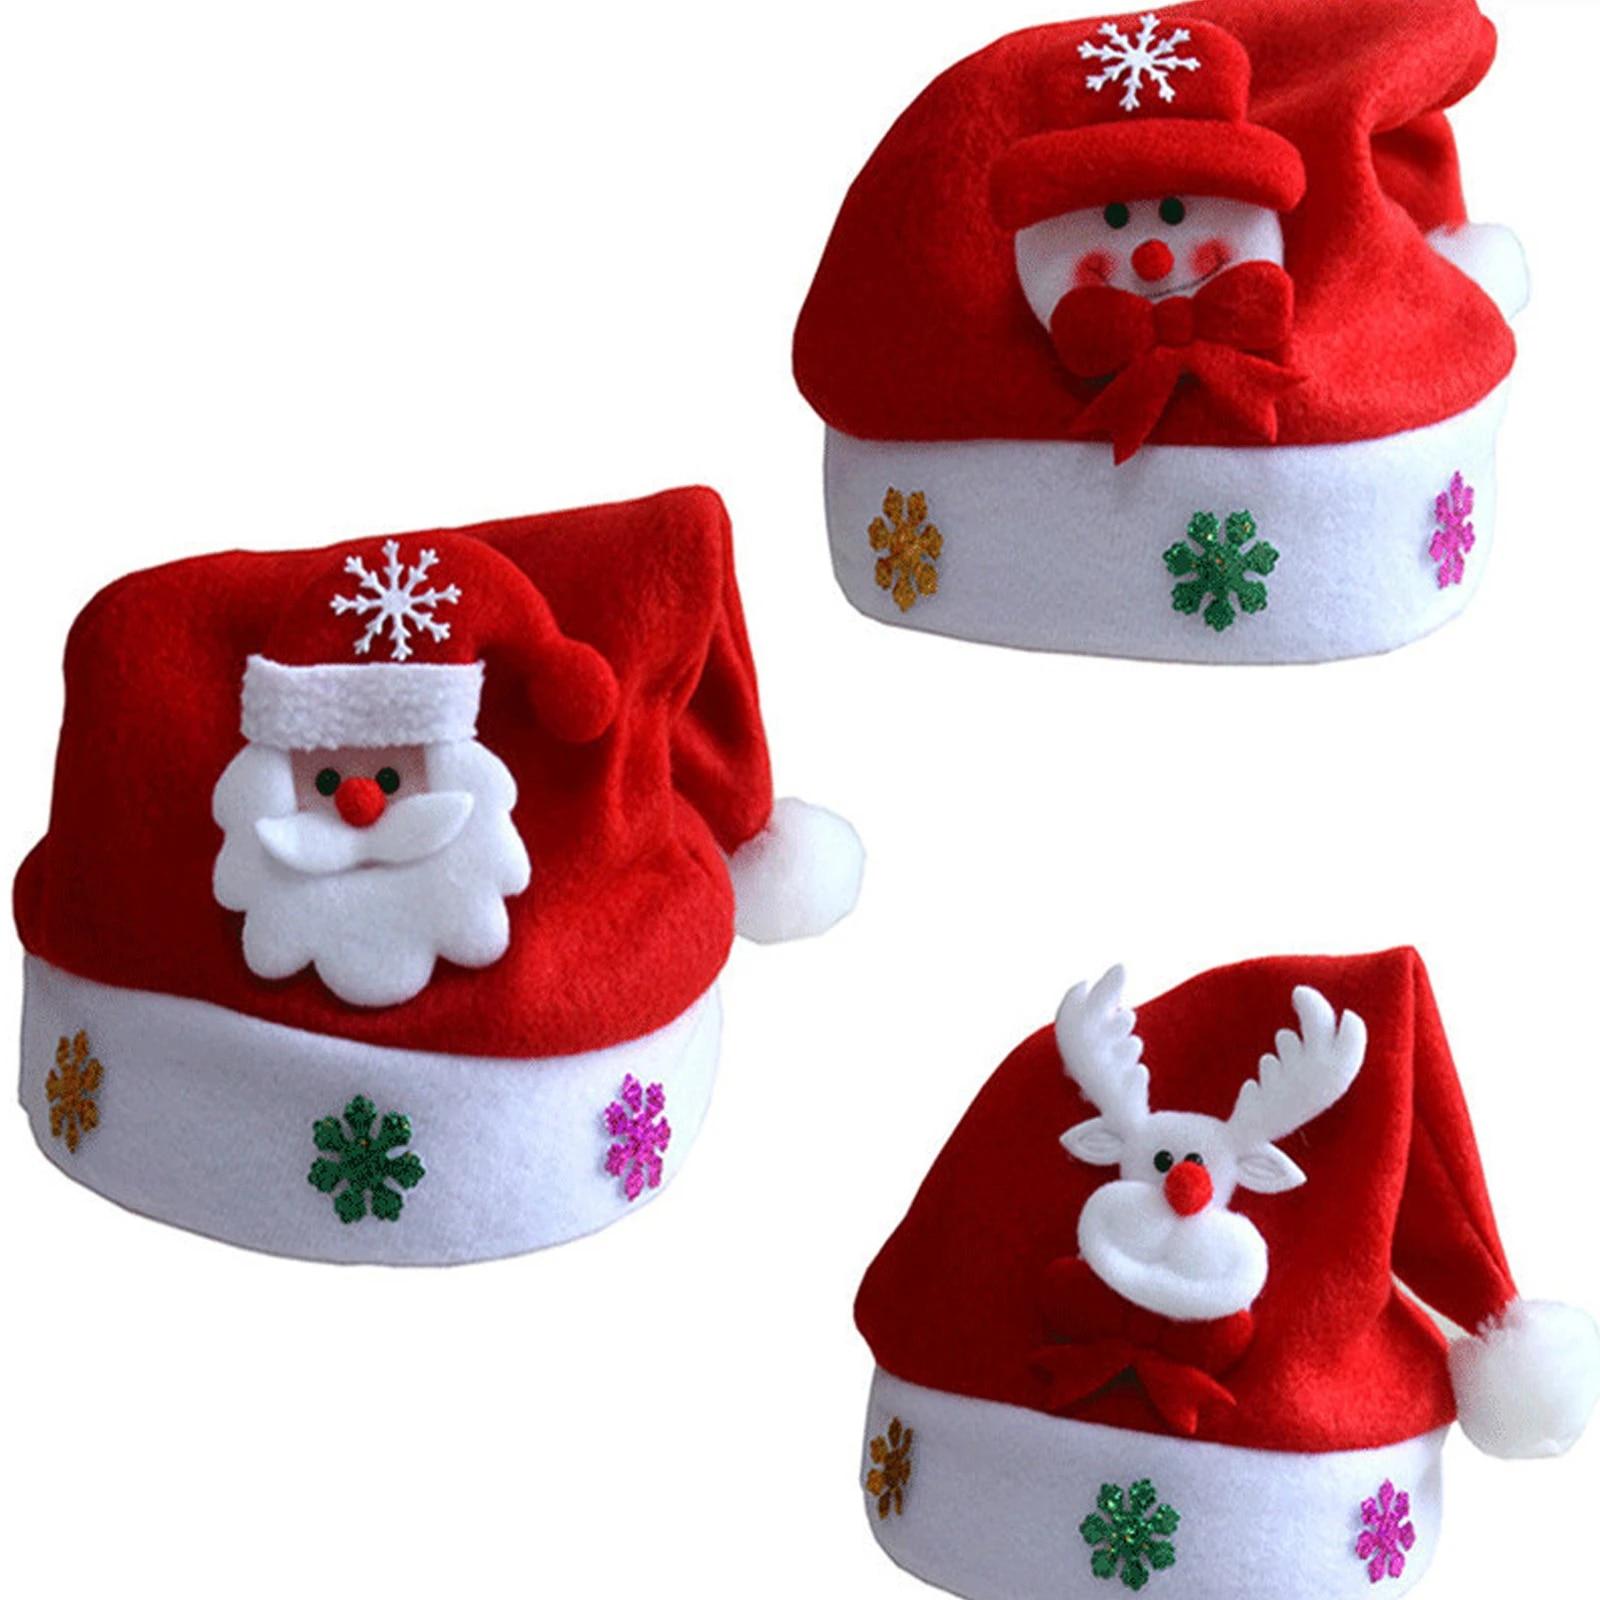 Christmas Vogue Glasses Santa Snowman Adult Kid Gift Item NEW